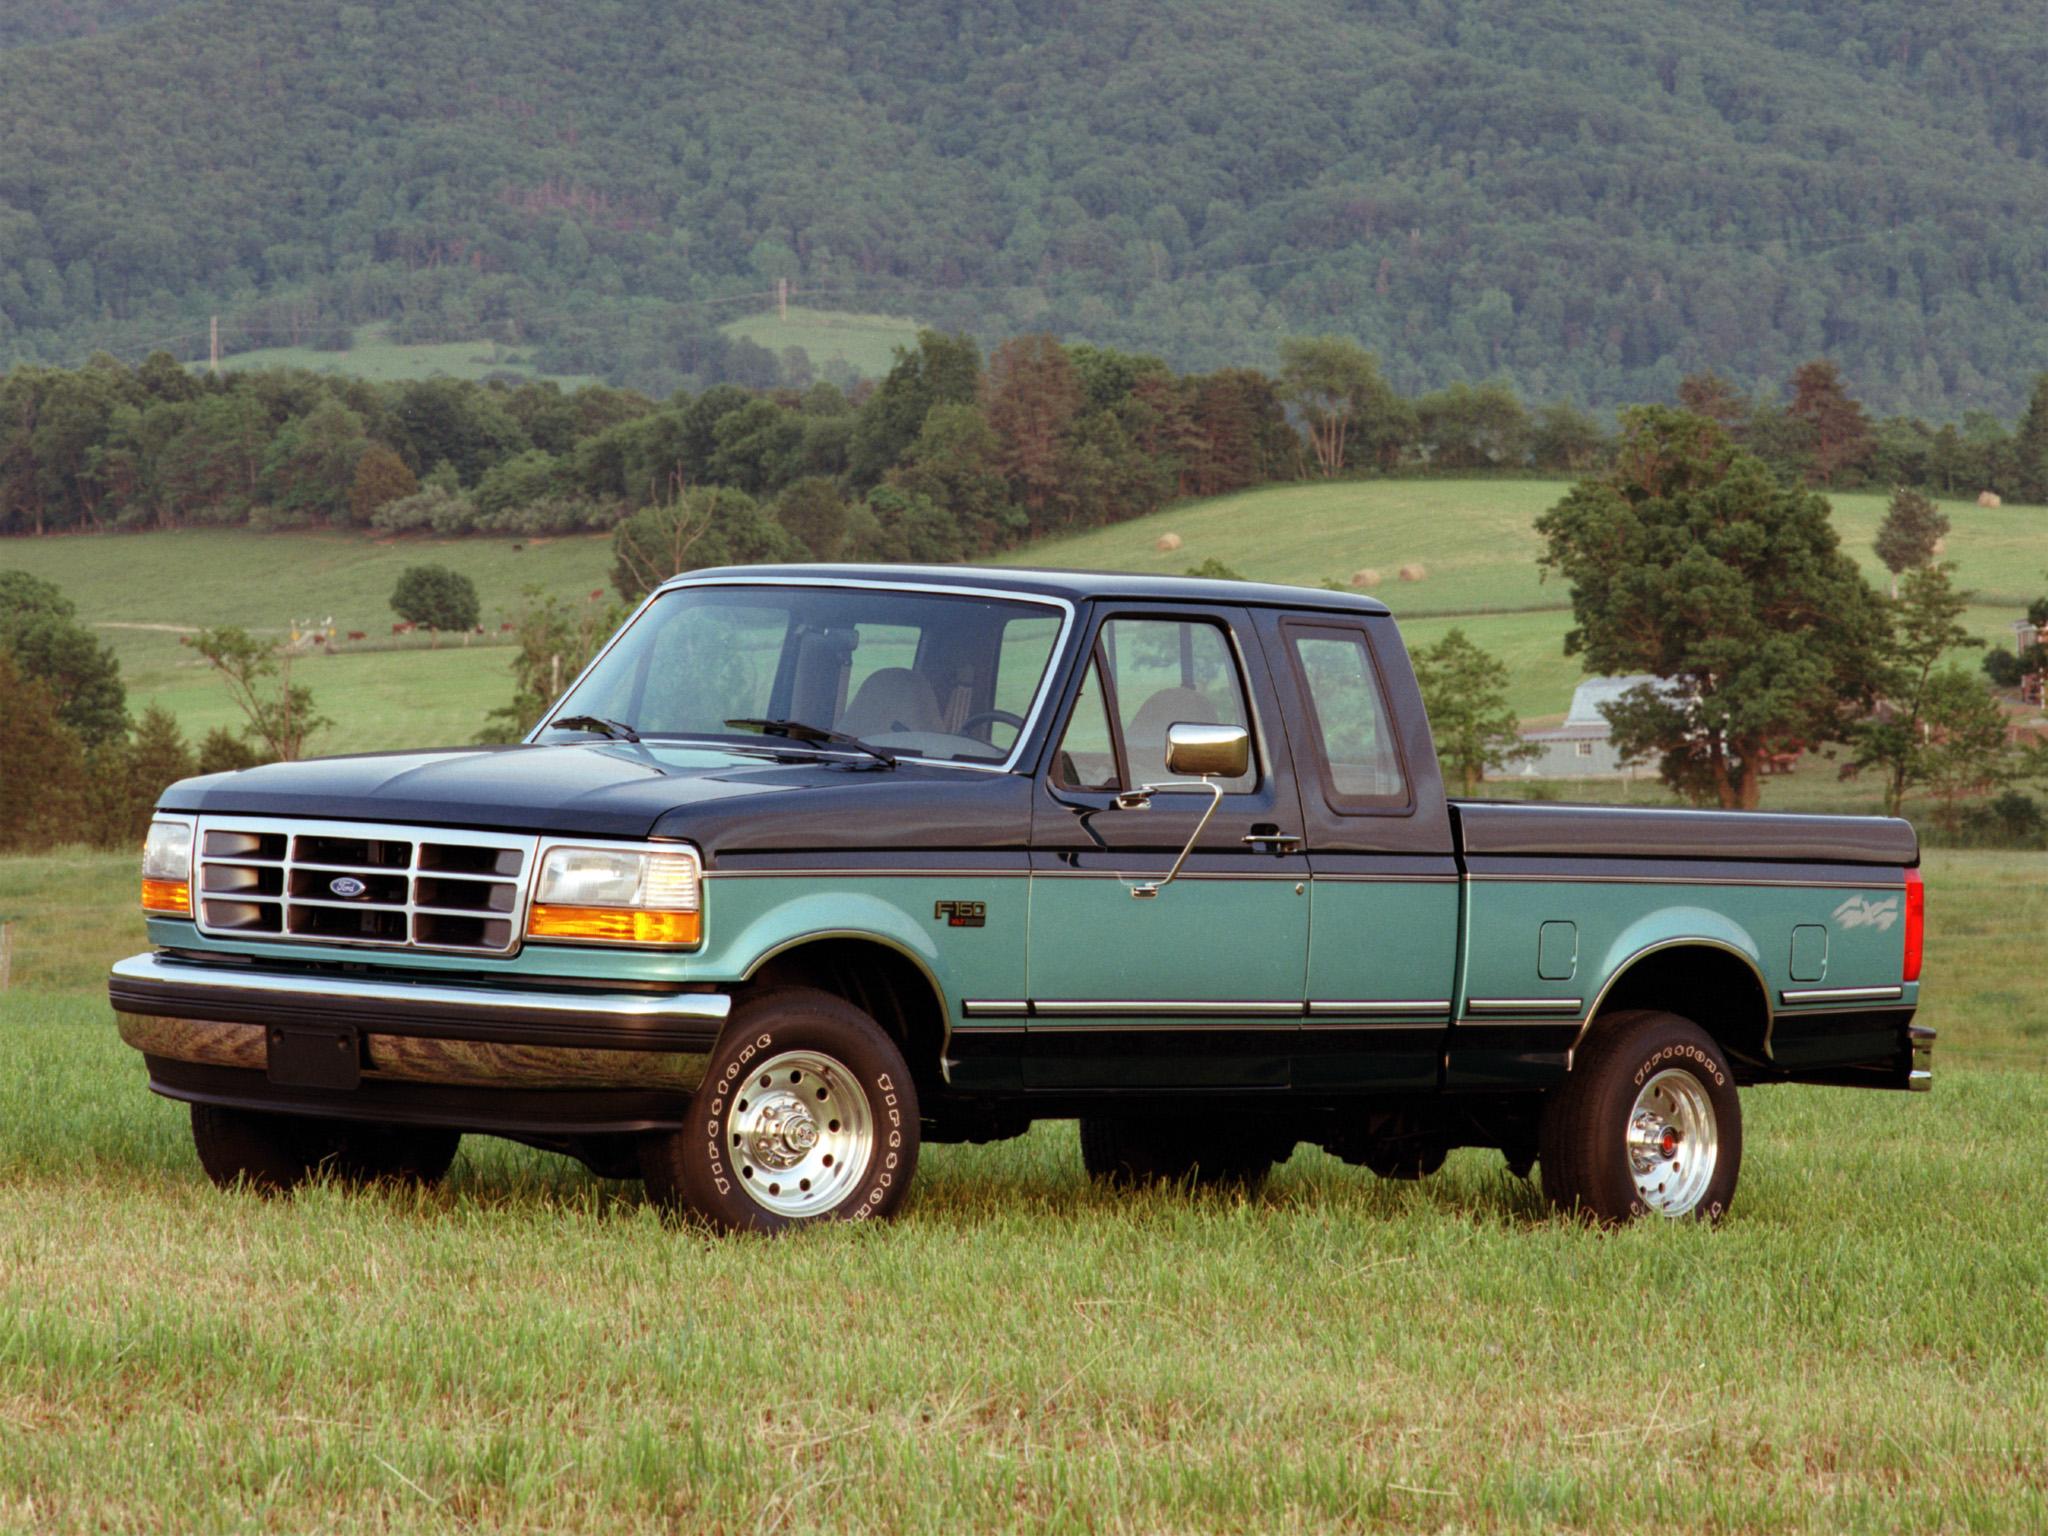 1992 Ford F 150 XLT 4x4 pickup wallpaper background 2048x1536